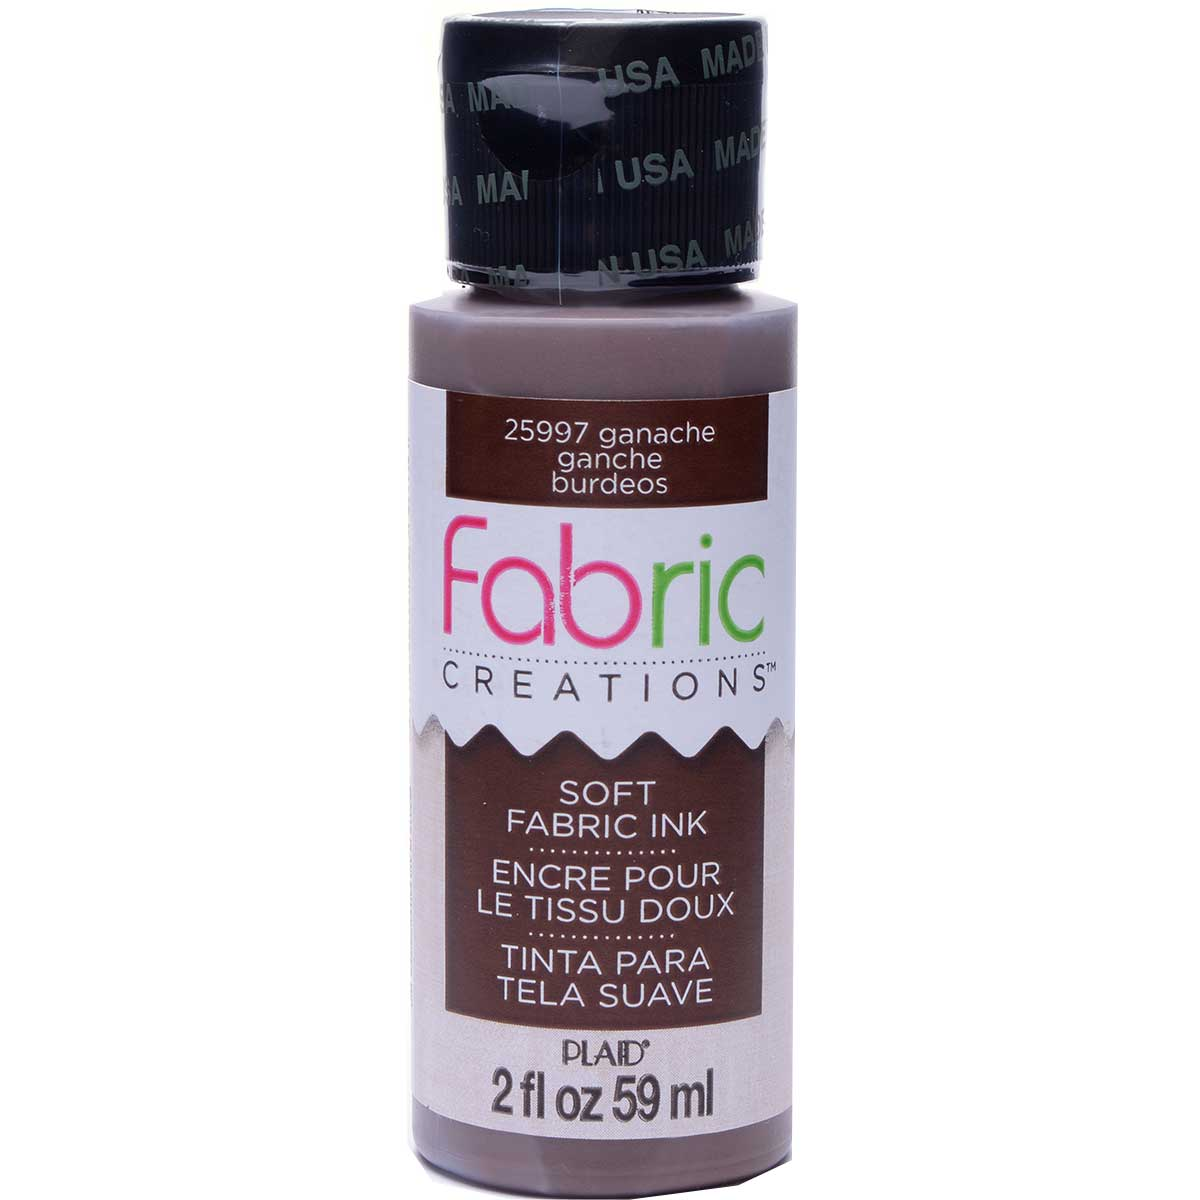 Fabric Creations™ Soft Fabric Inks - Ganache, 2 oz.